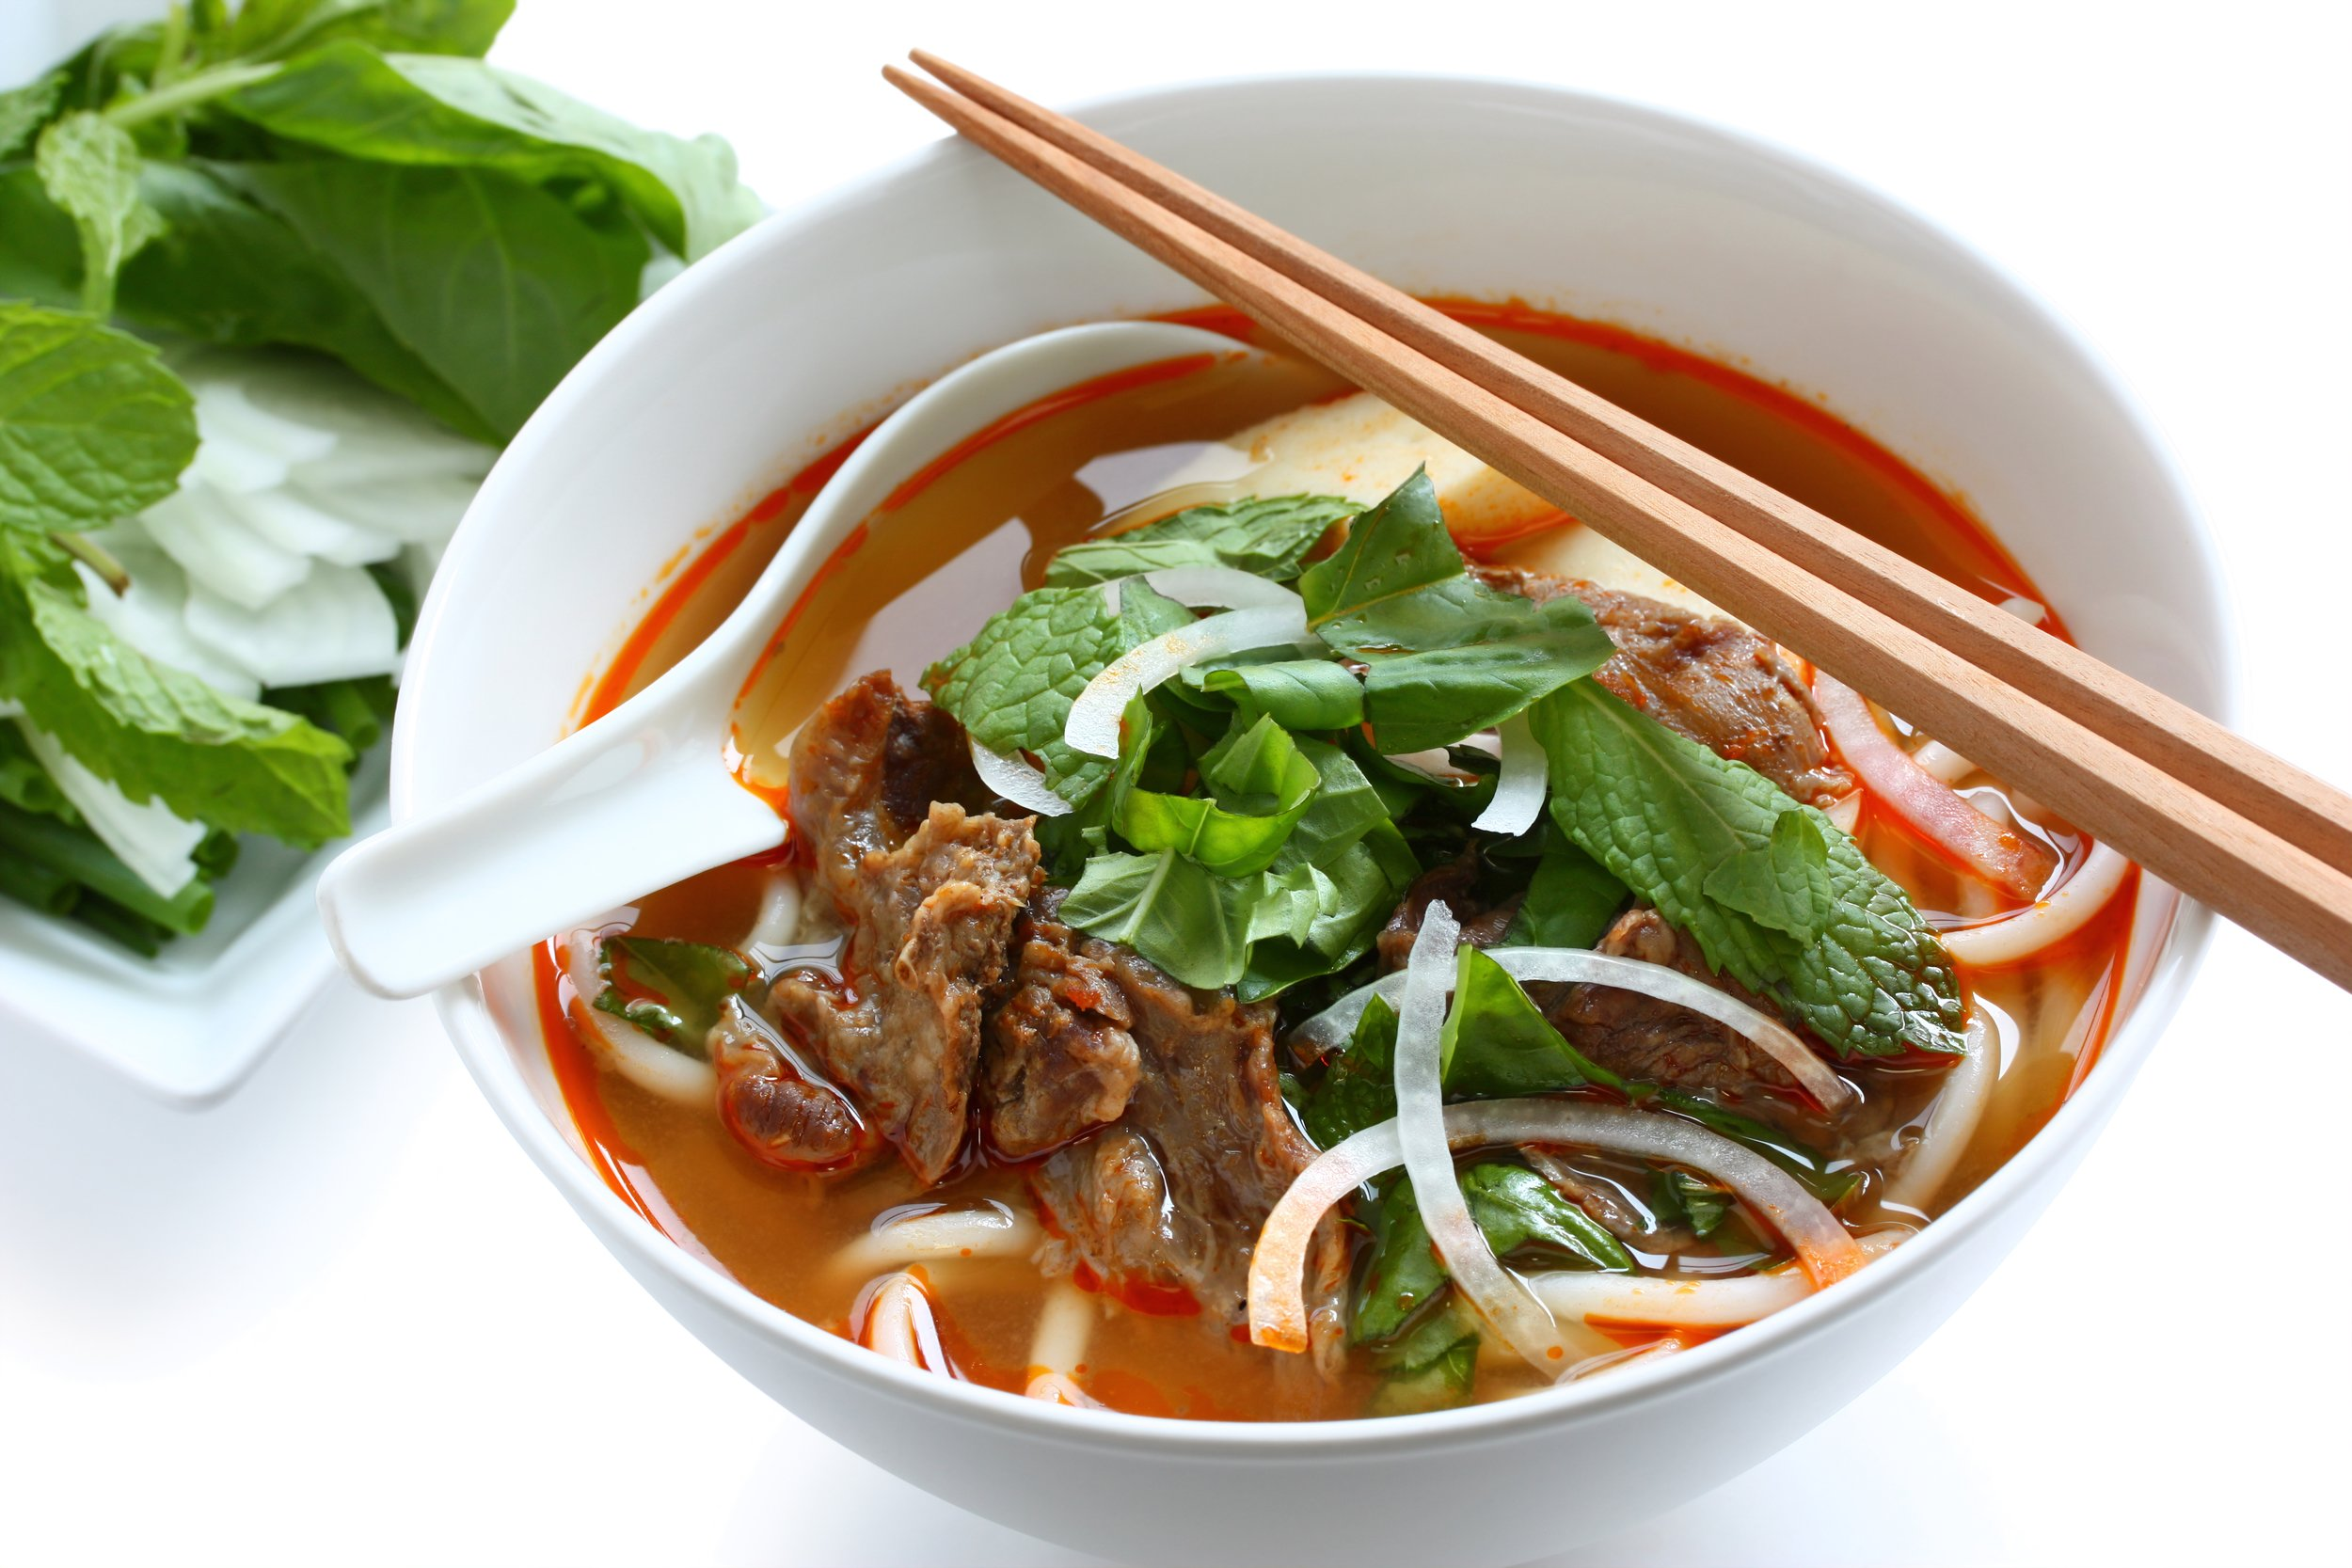 Spicy Beef Rice Noodle - Bún Bò Huế - $6.99 Small / $8.99 Medium / $10.99 Large